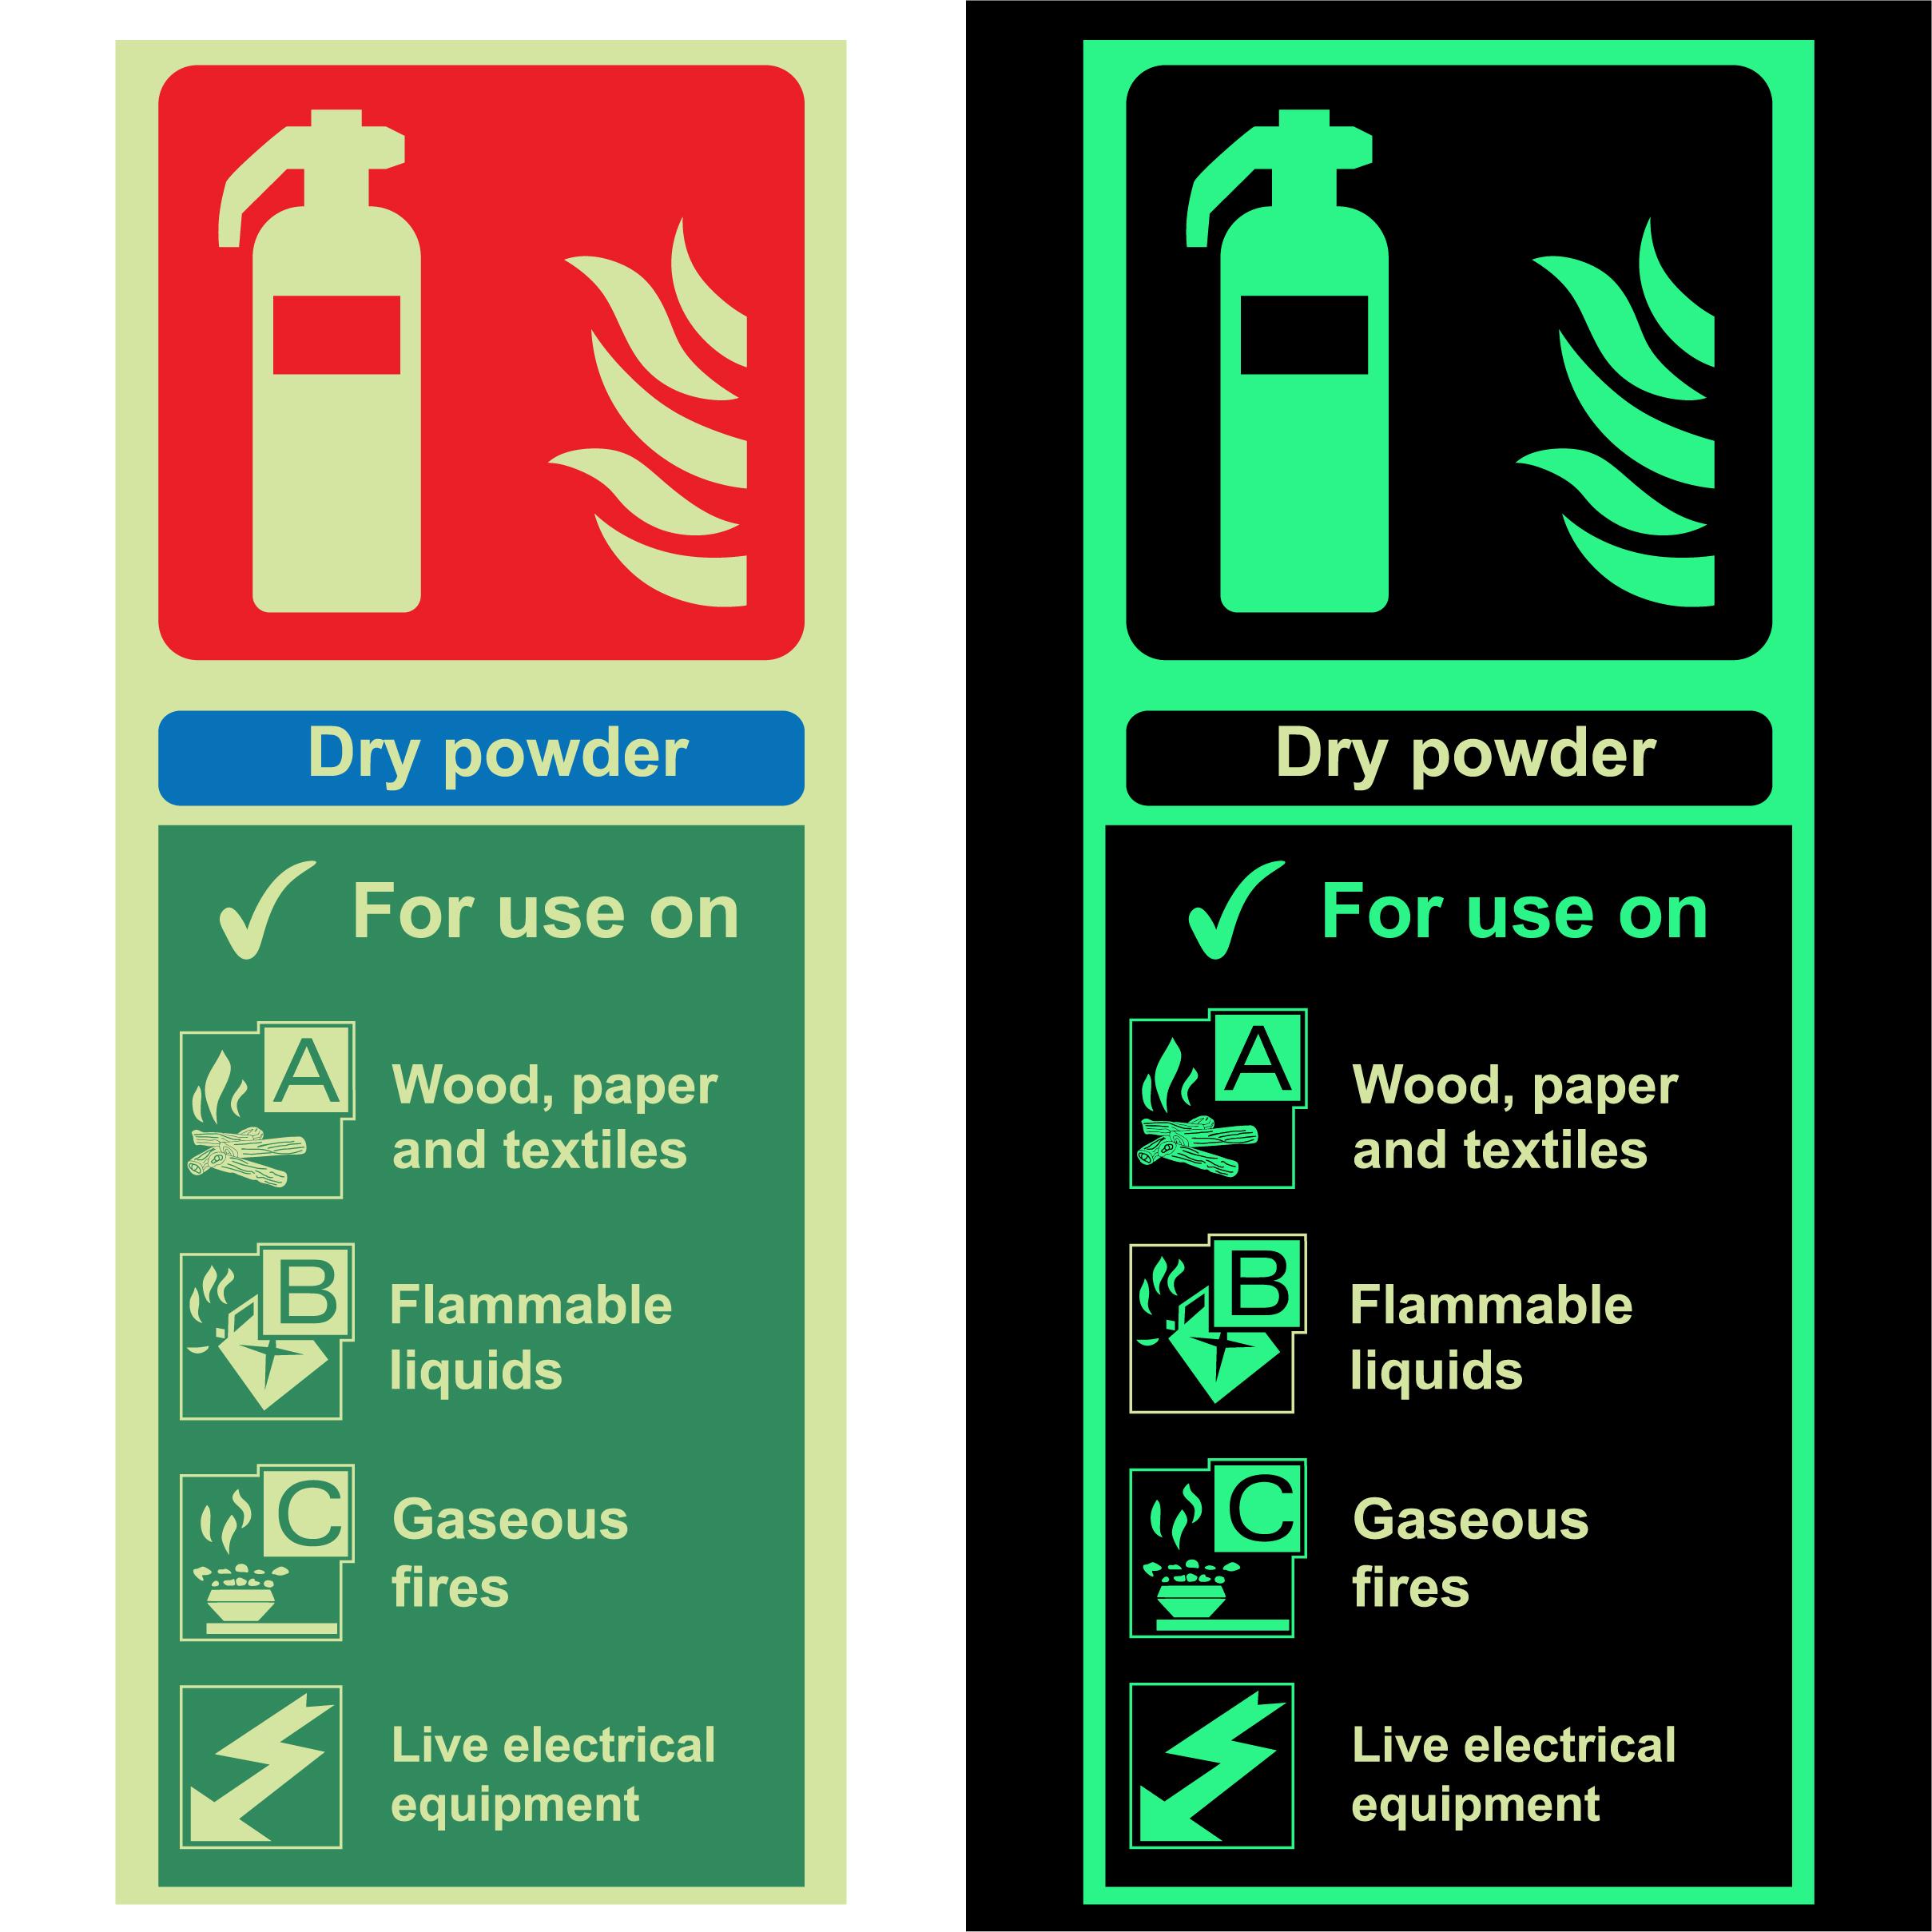 Photoluminescent Fire Extinguisher – Dry Powder